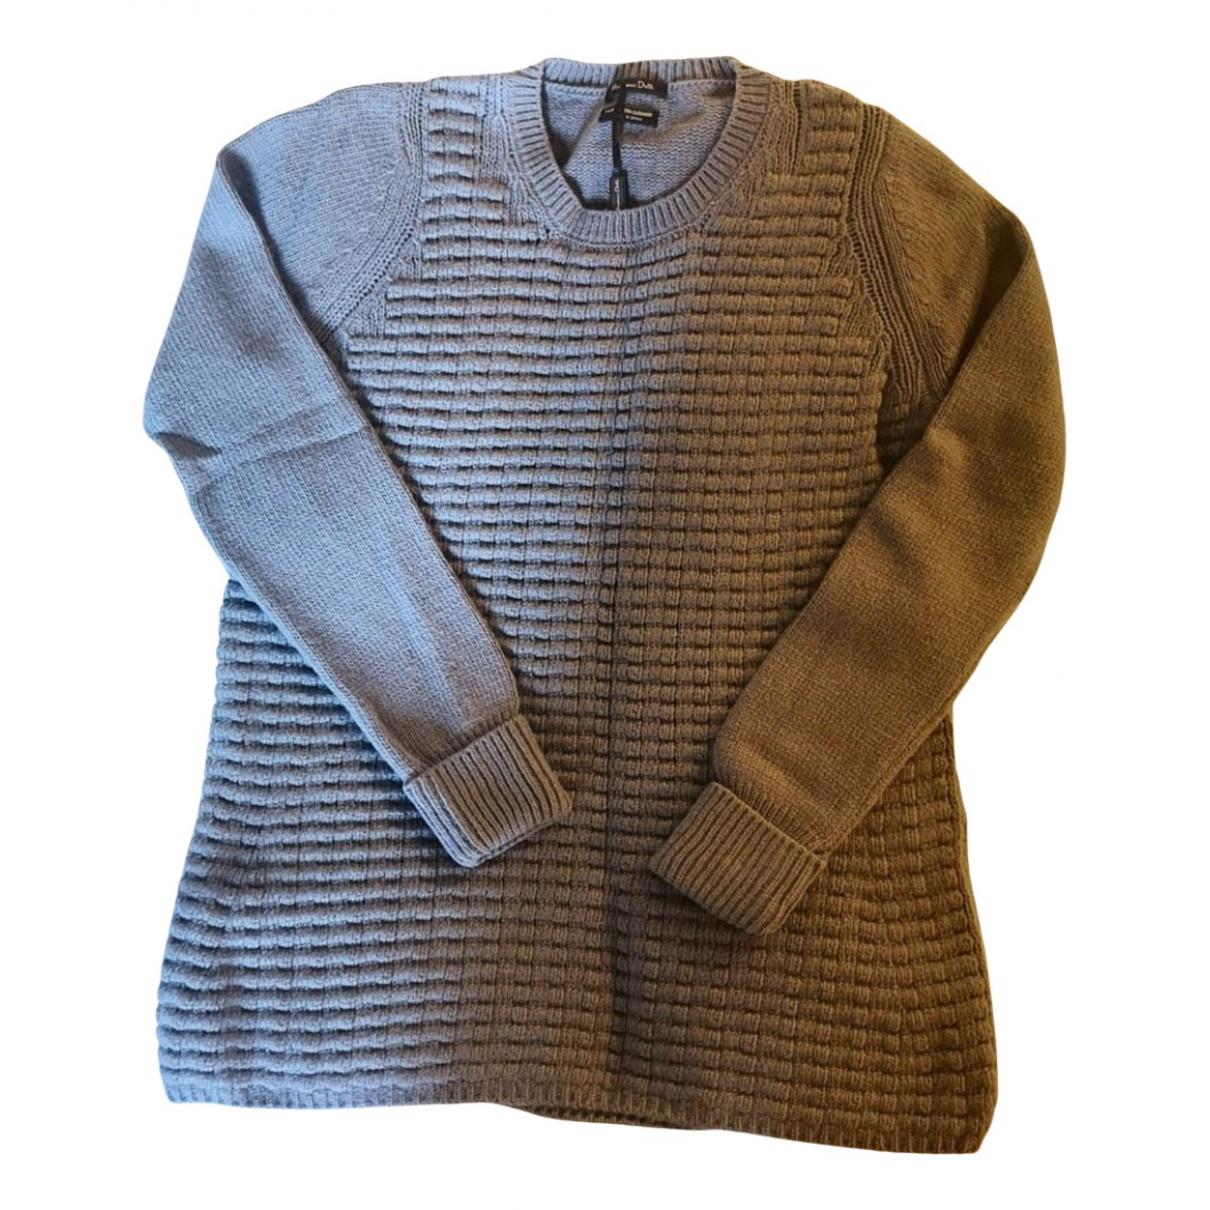 Massimo Dutti N Grey Wool Knitwear for Women S International